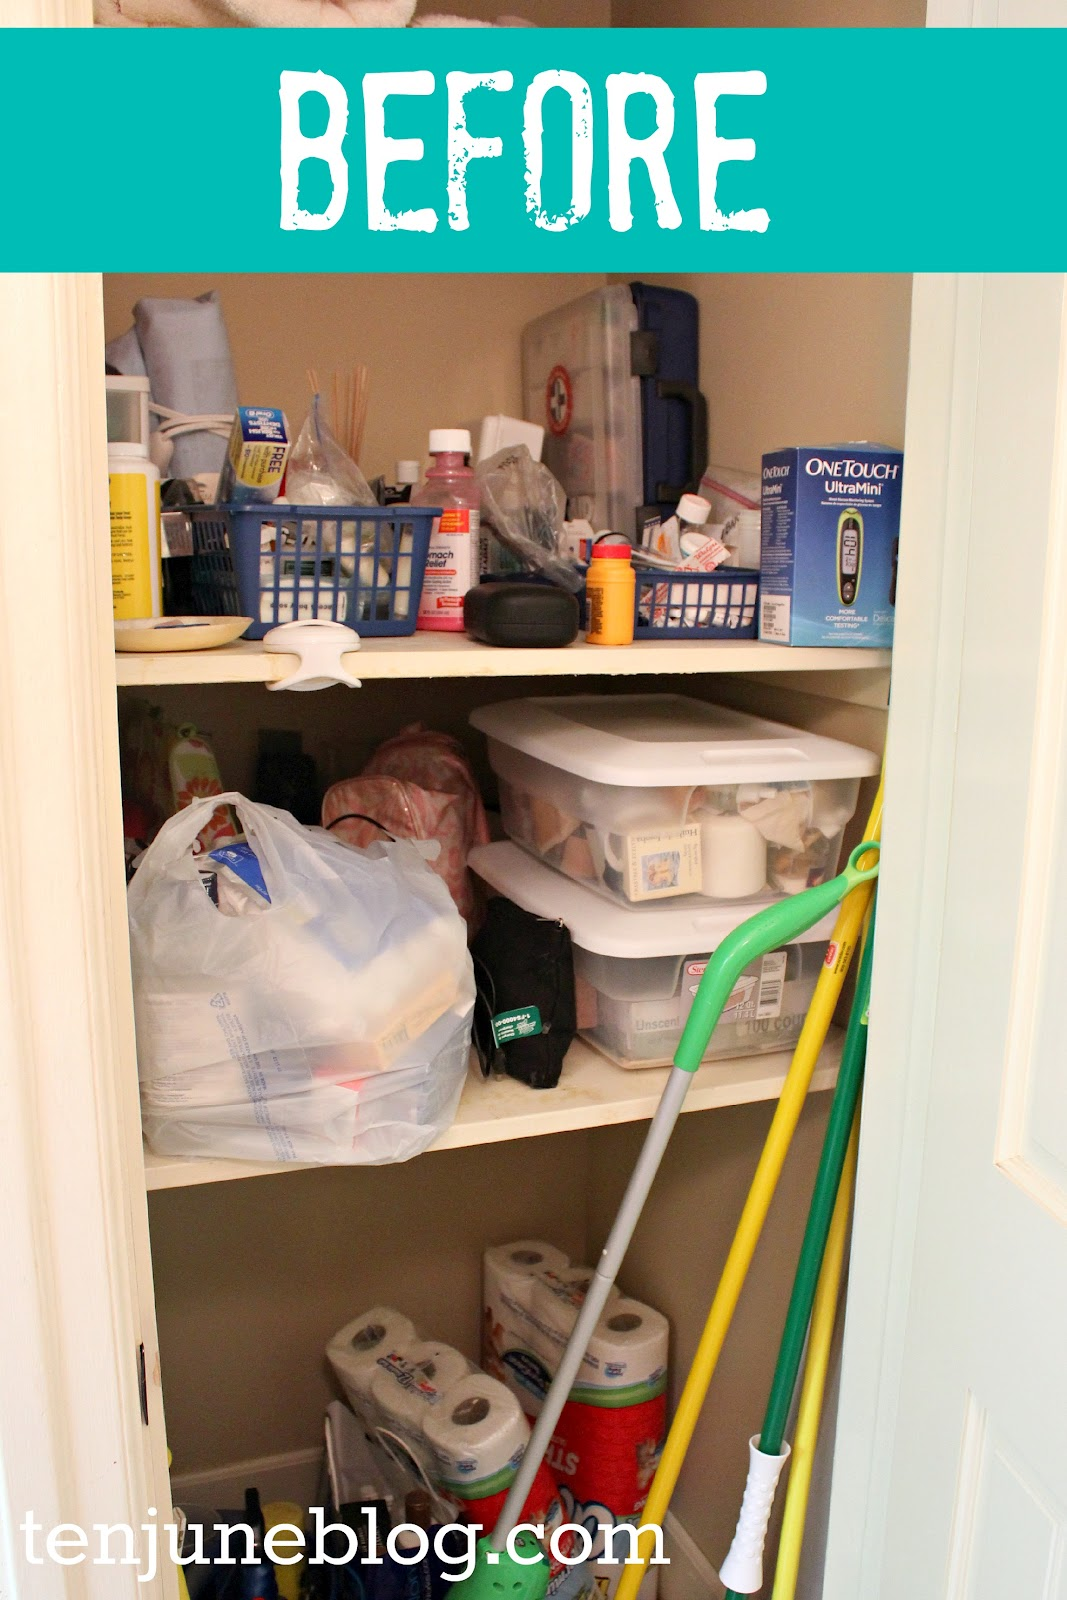 Bathroom closet organizer